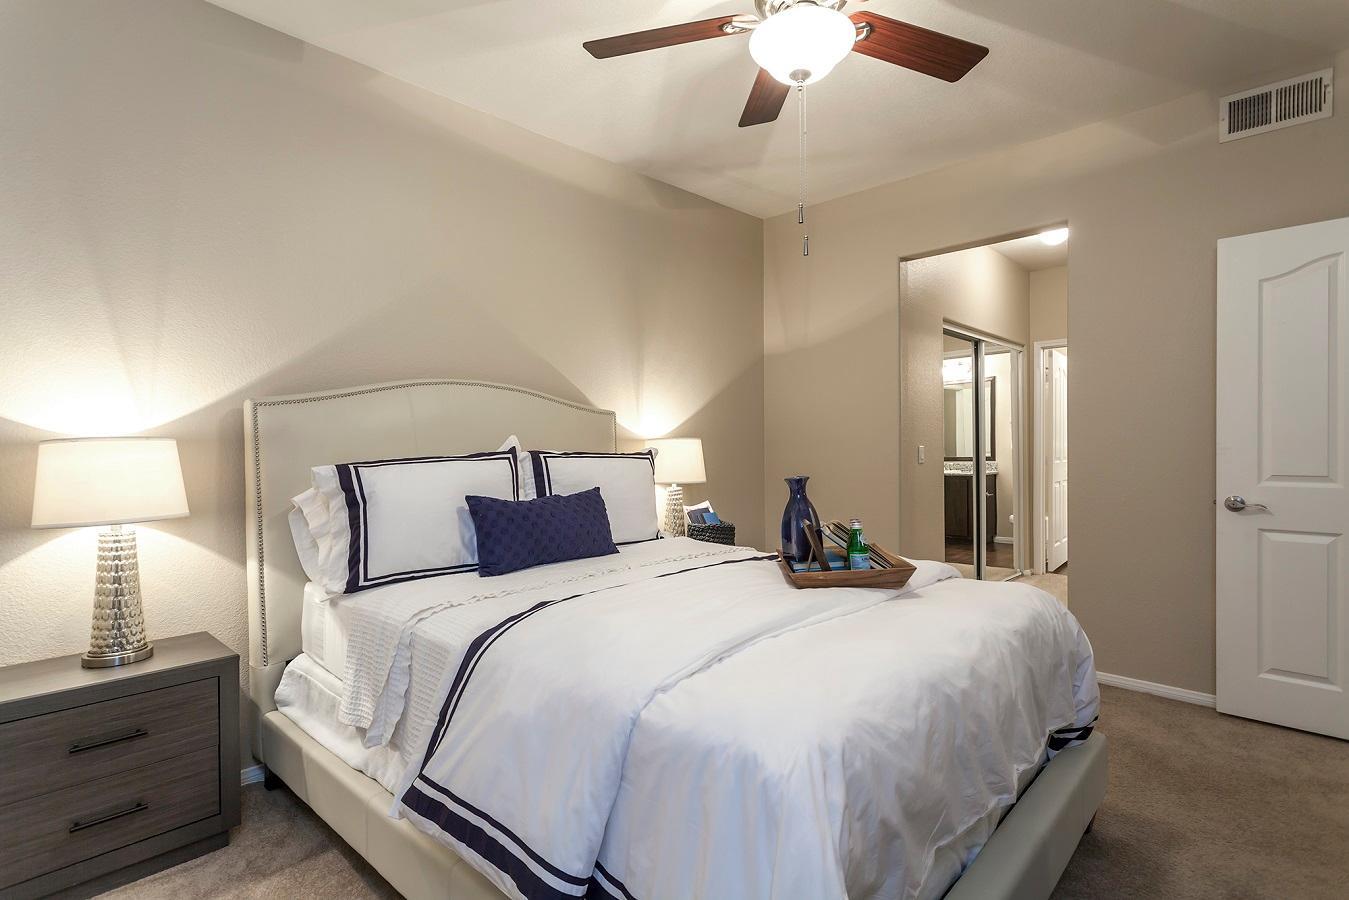 Camden Crown Valley Apartments image 6